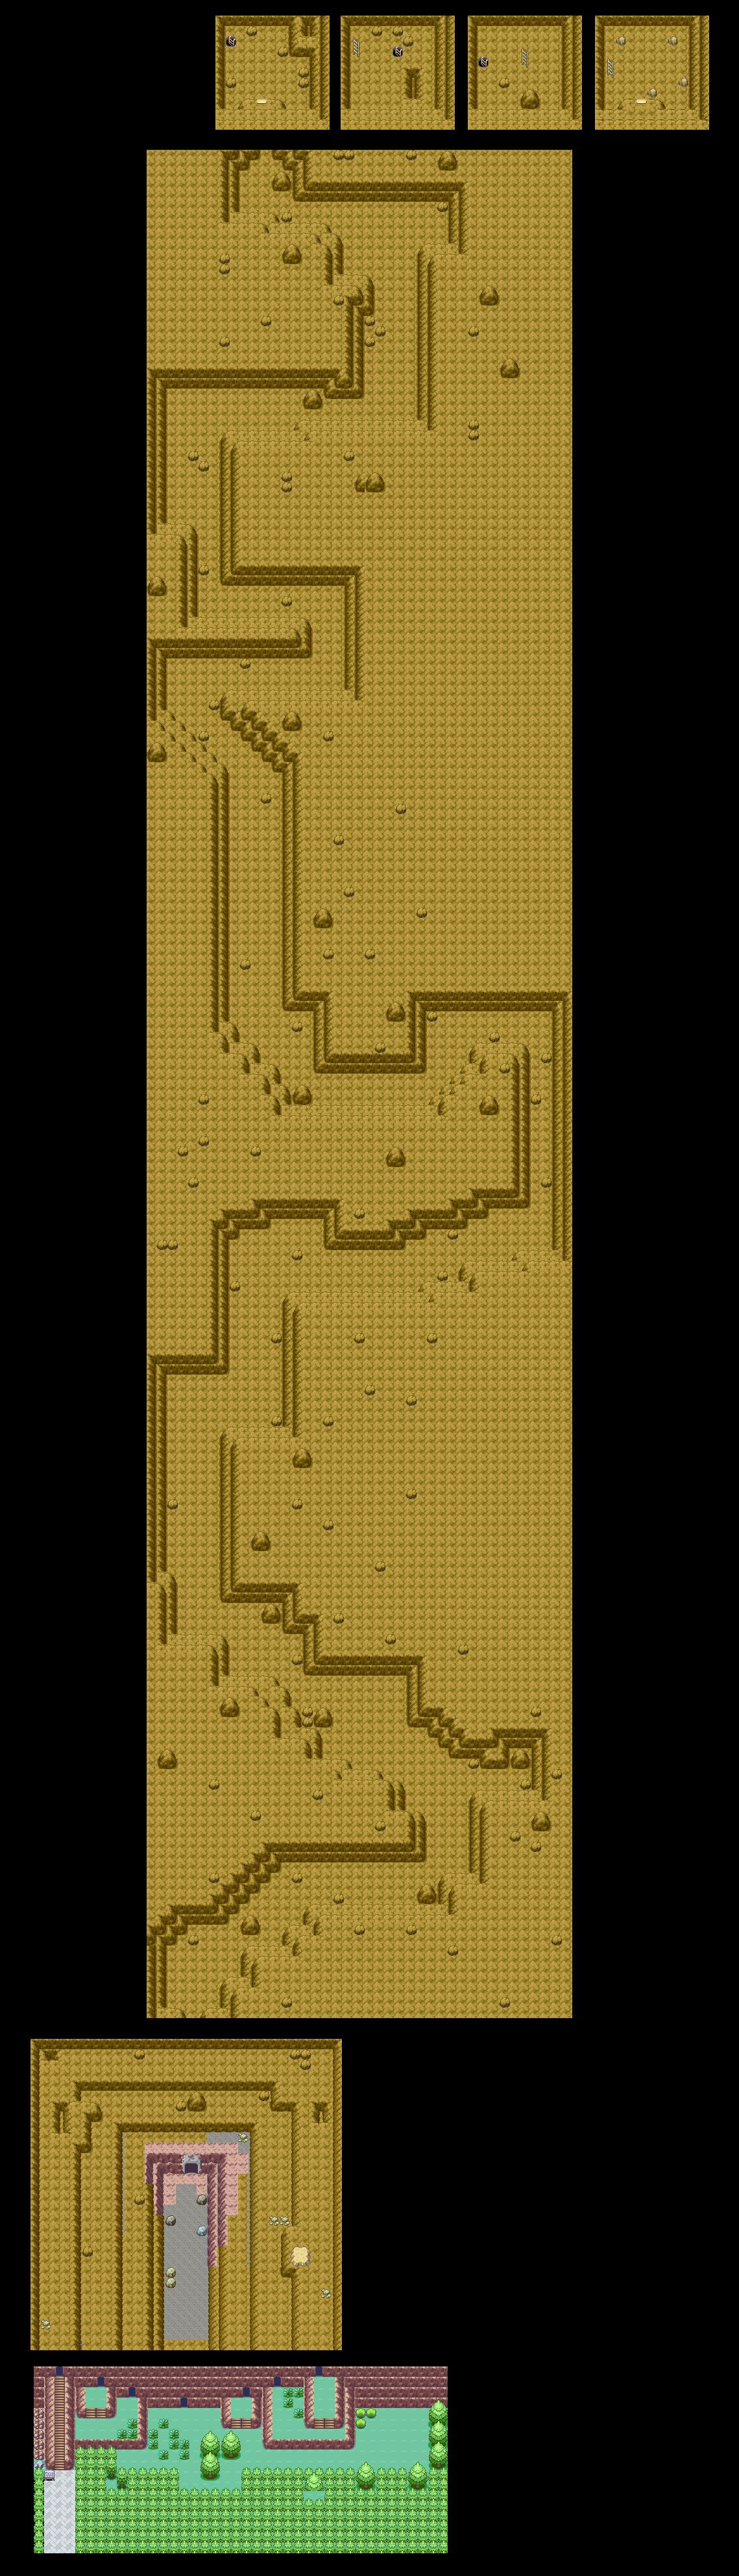 Pokémon-Map: Erste Mappingversuche 4